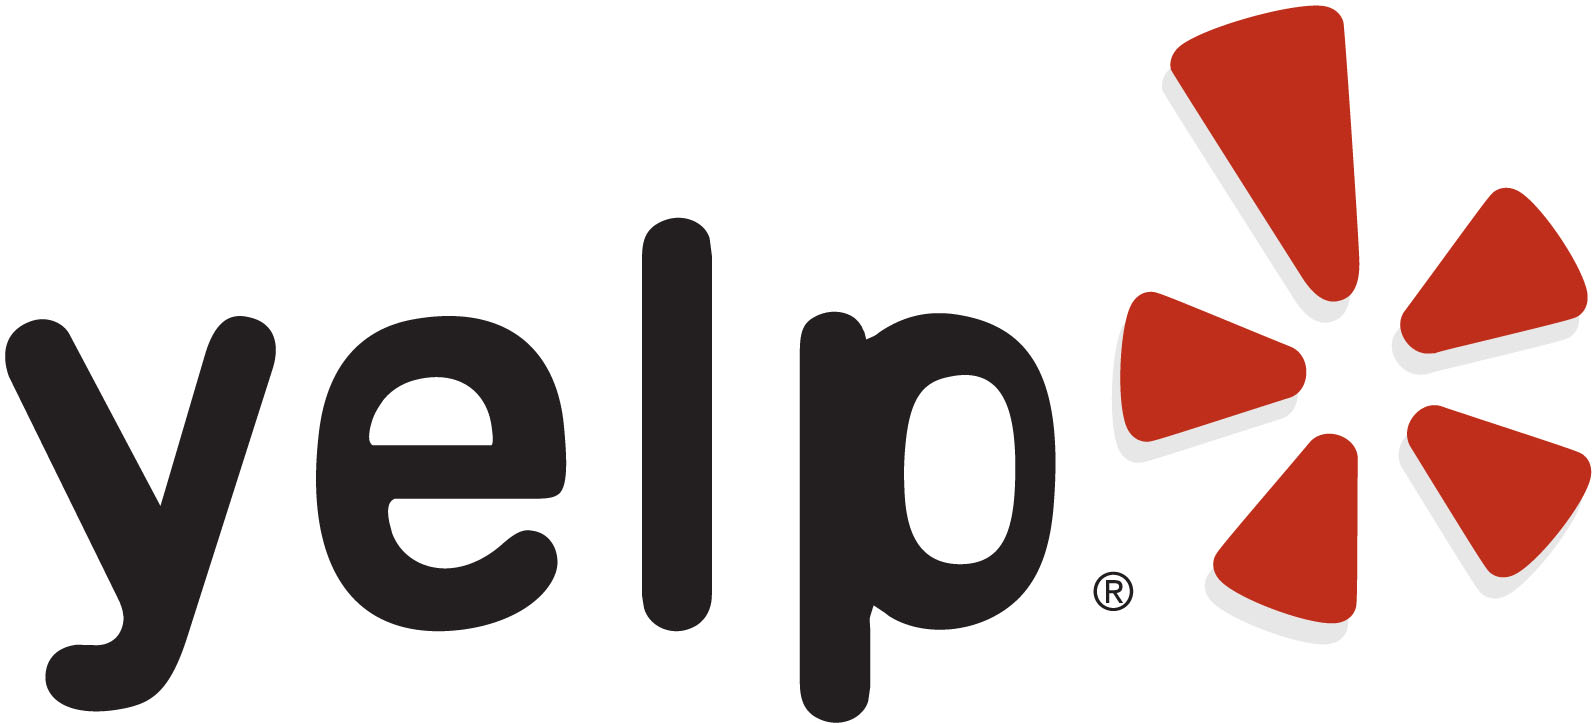 Yelp Review Logo